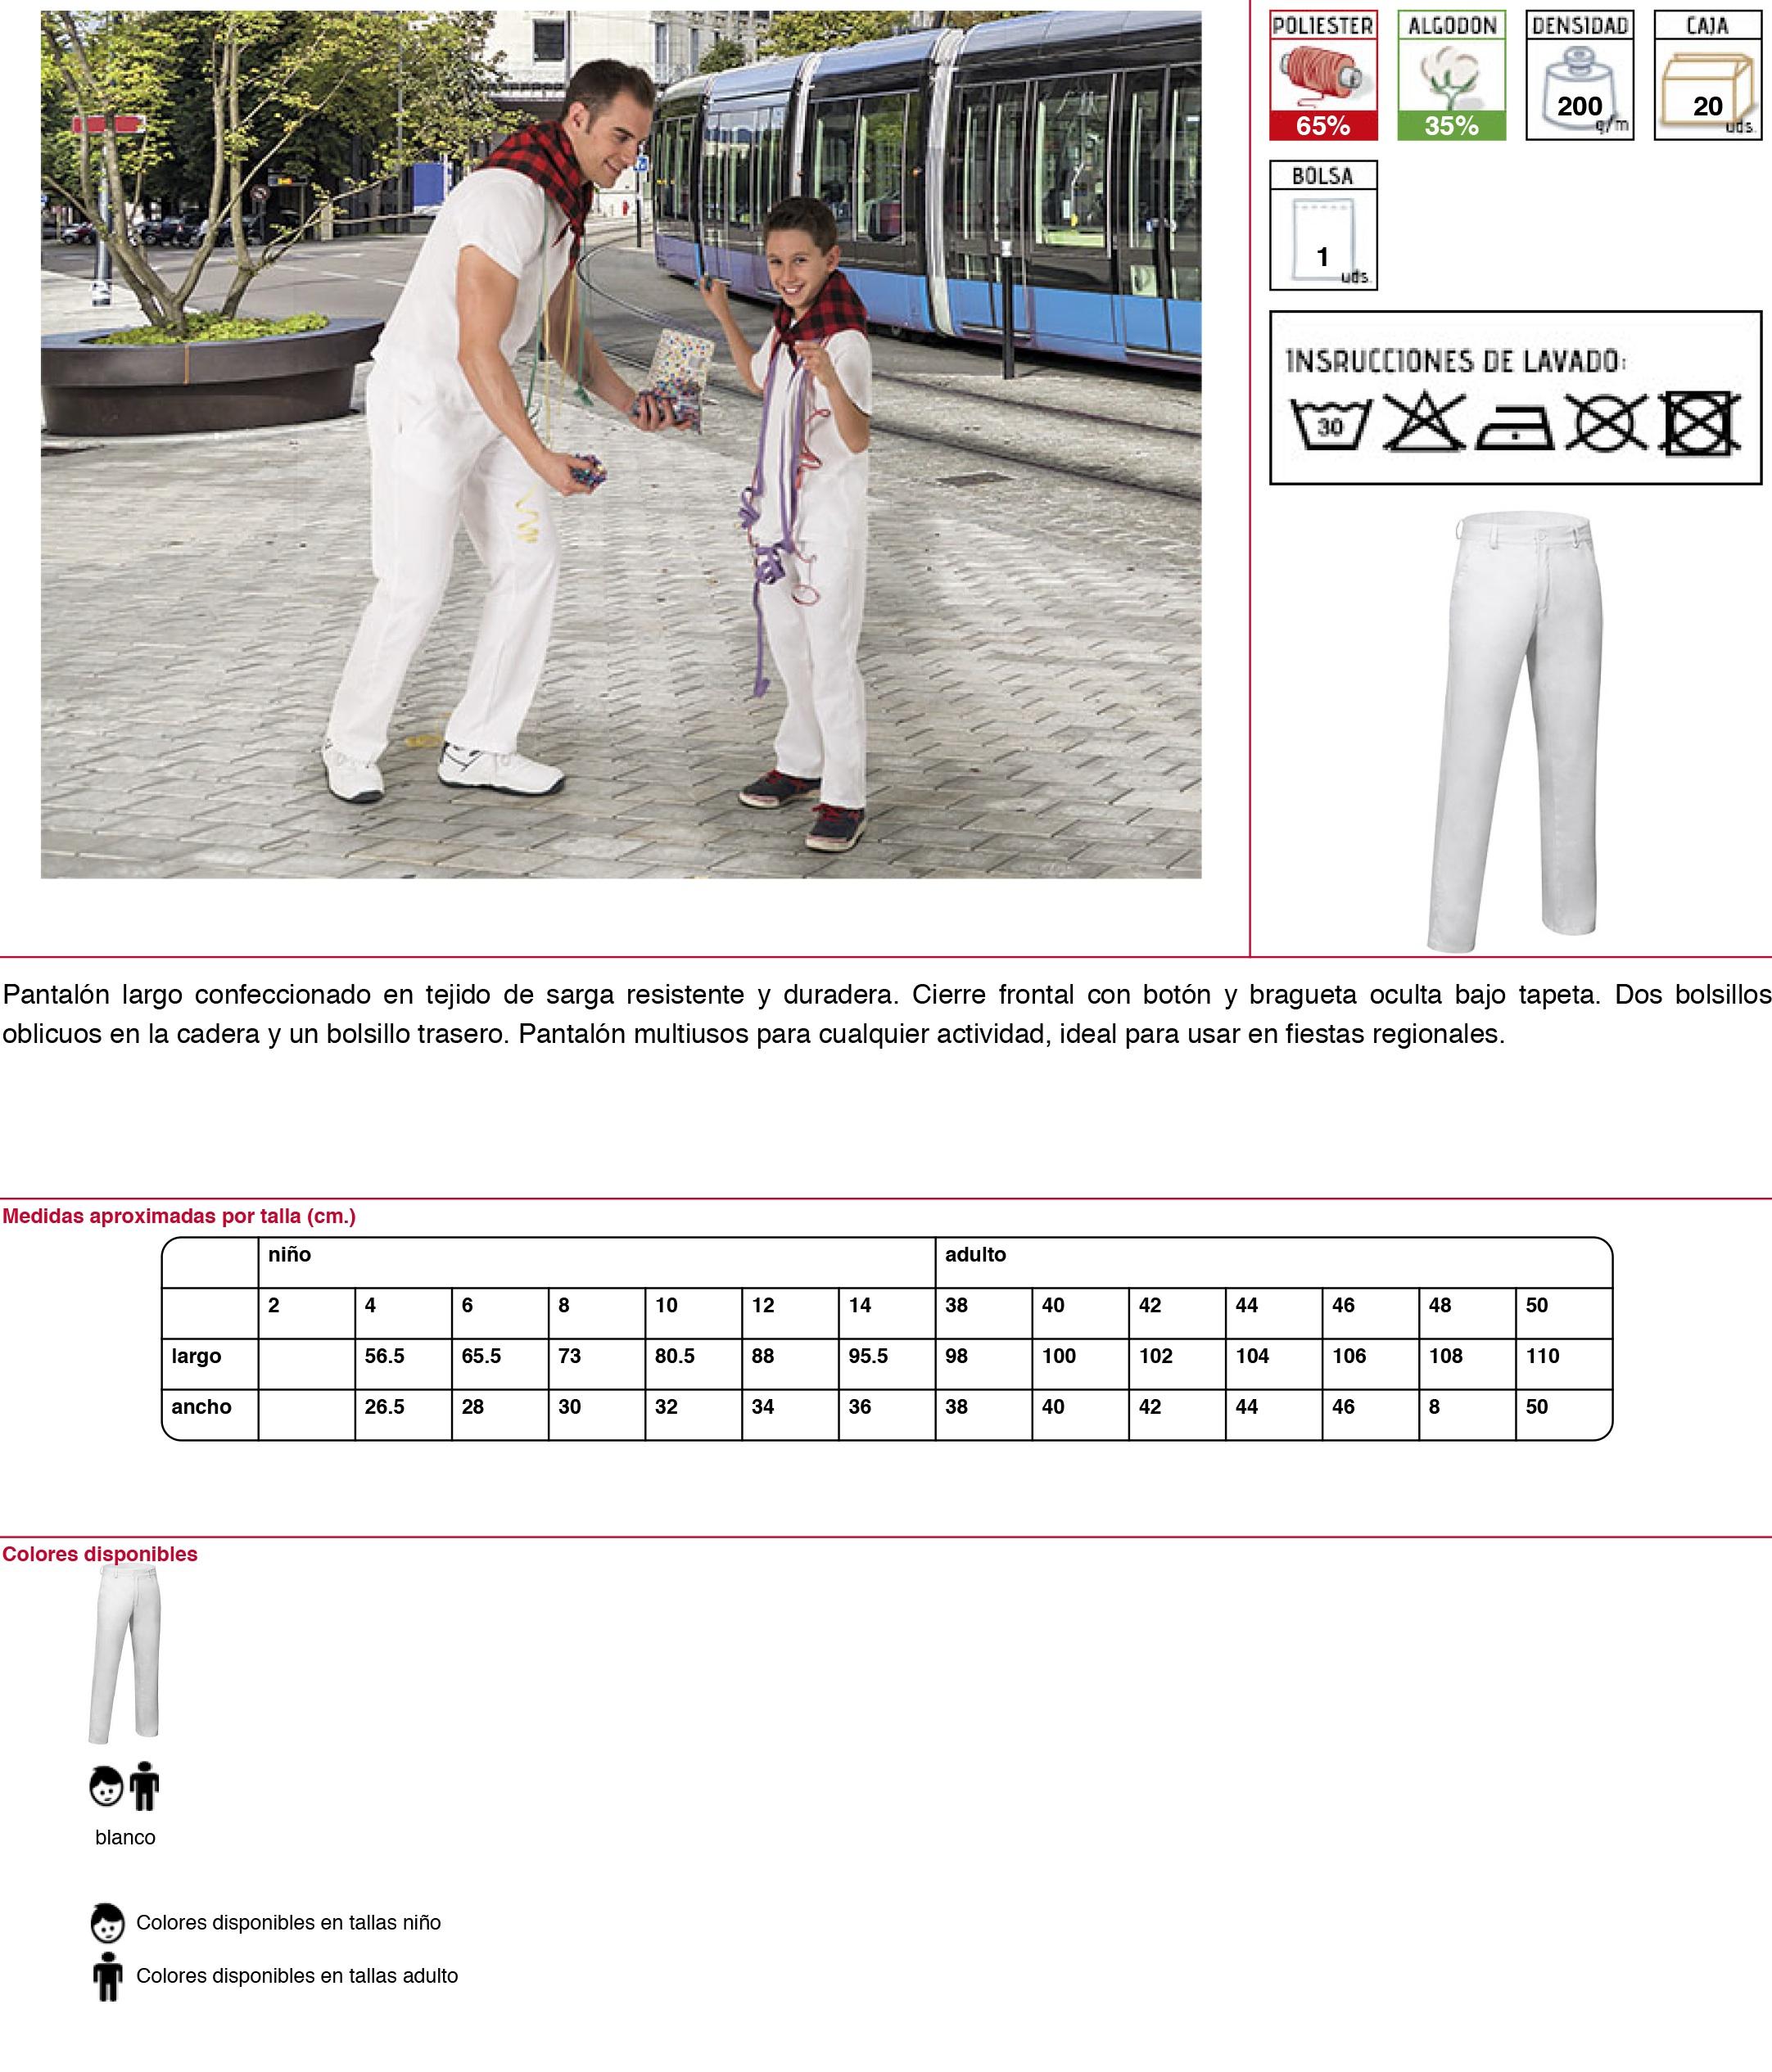 Pantalones blancos baratos: 6,40€